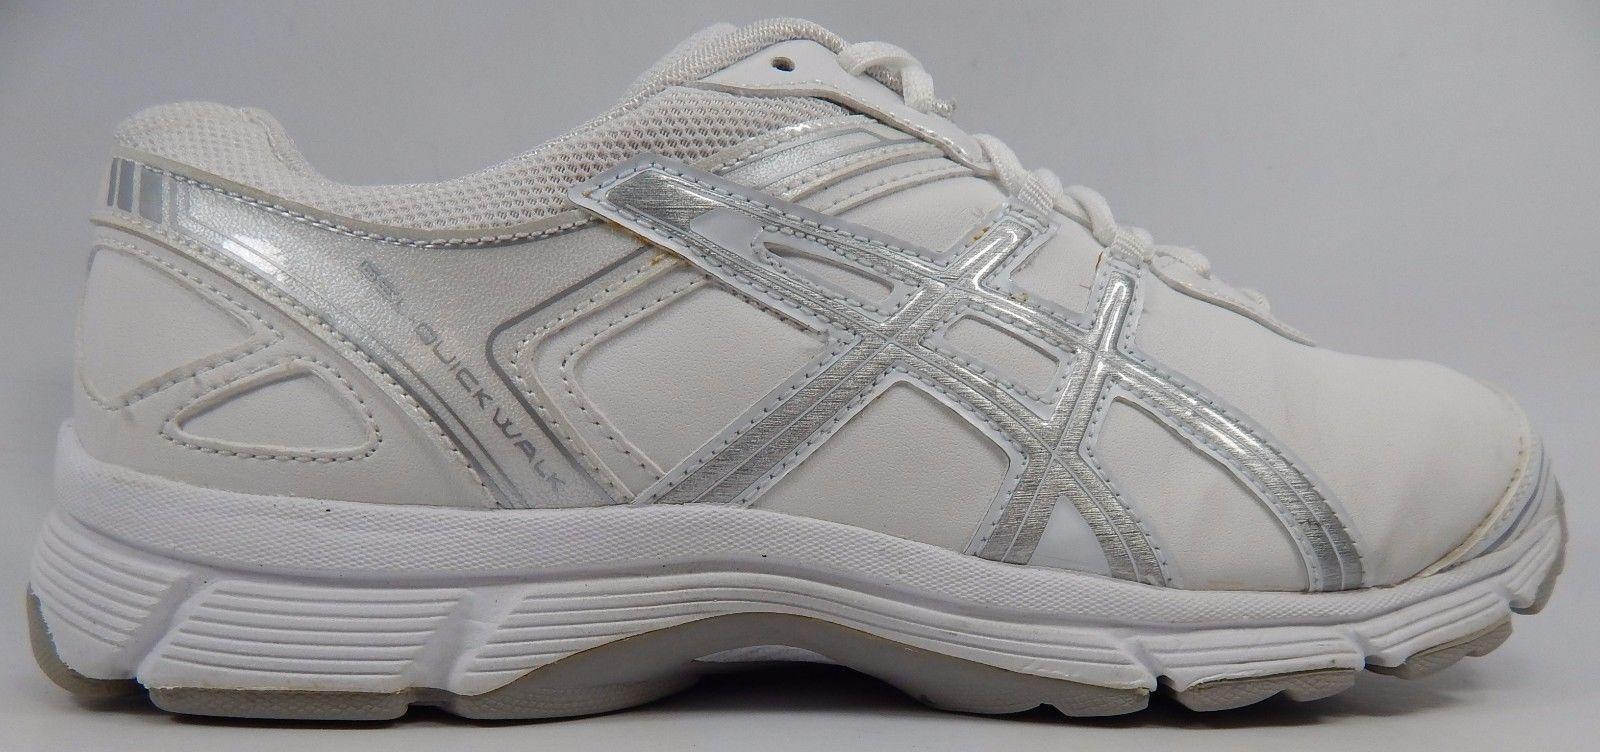 Asics Gel Quick Walk 2 Women's Walking Shoes Size US 9 M (B) EU 40.5 White Q472Y